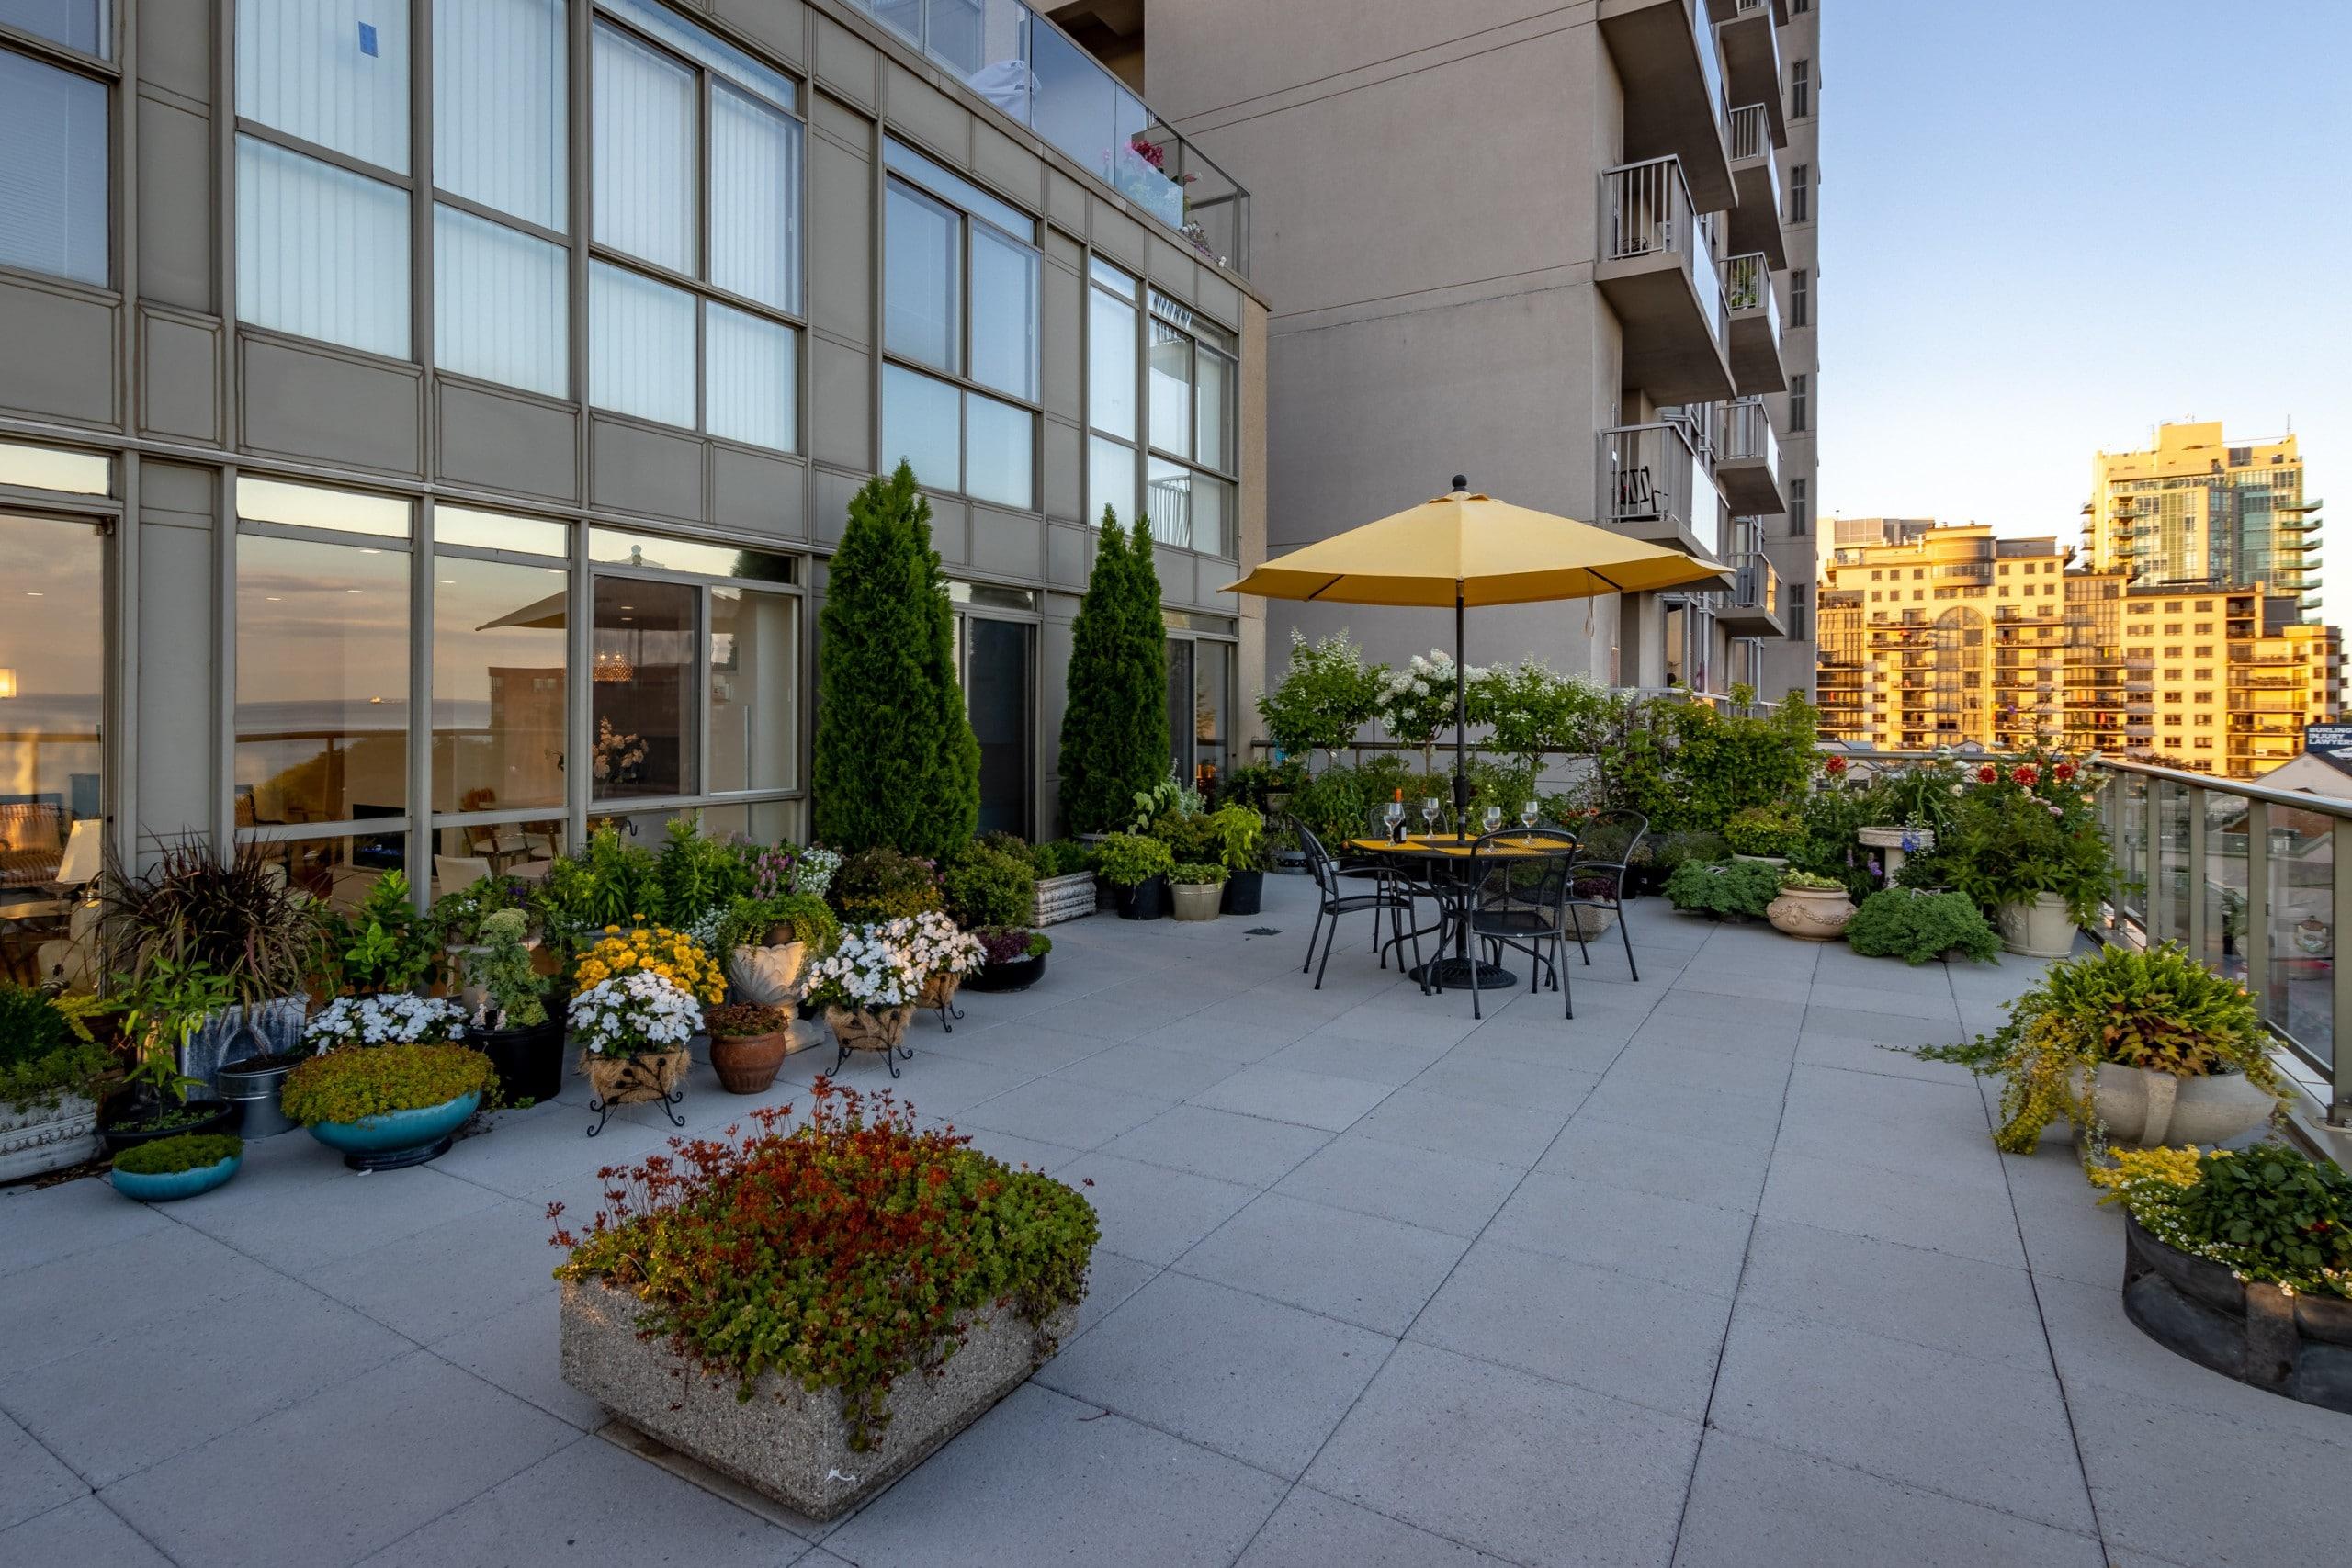 Balcony featured at 508 – 415 Locust Street, Burlington, ON at Alex Irish & Associates